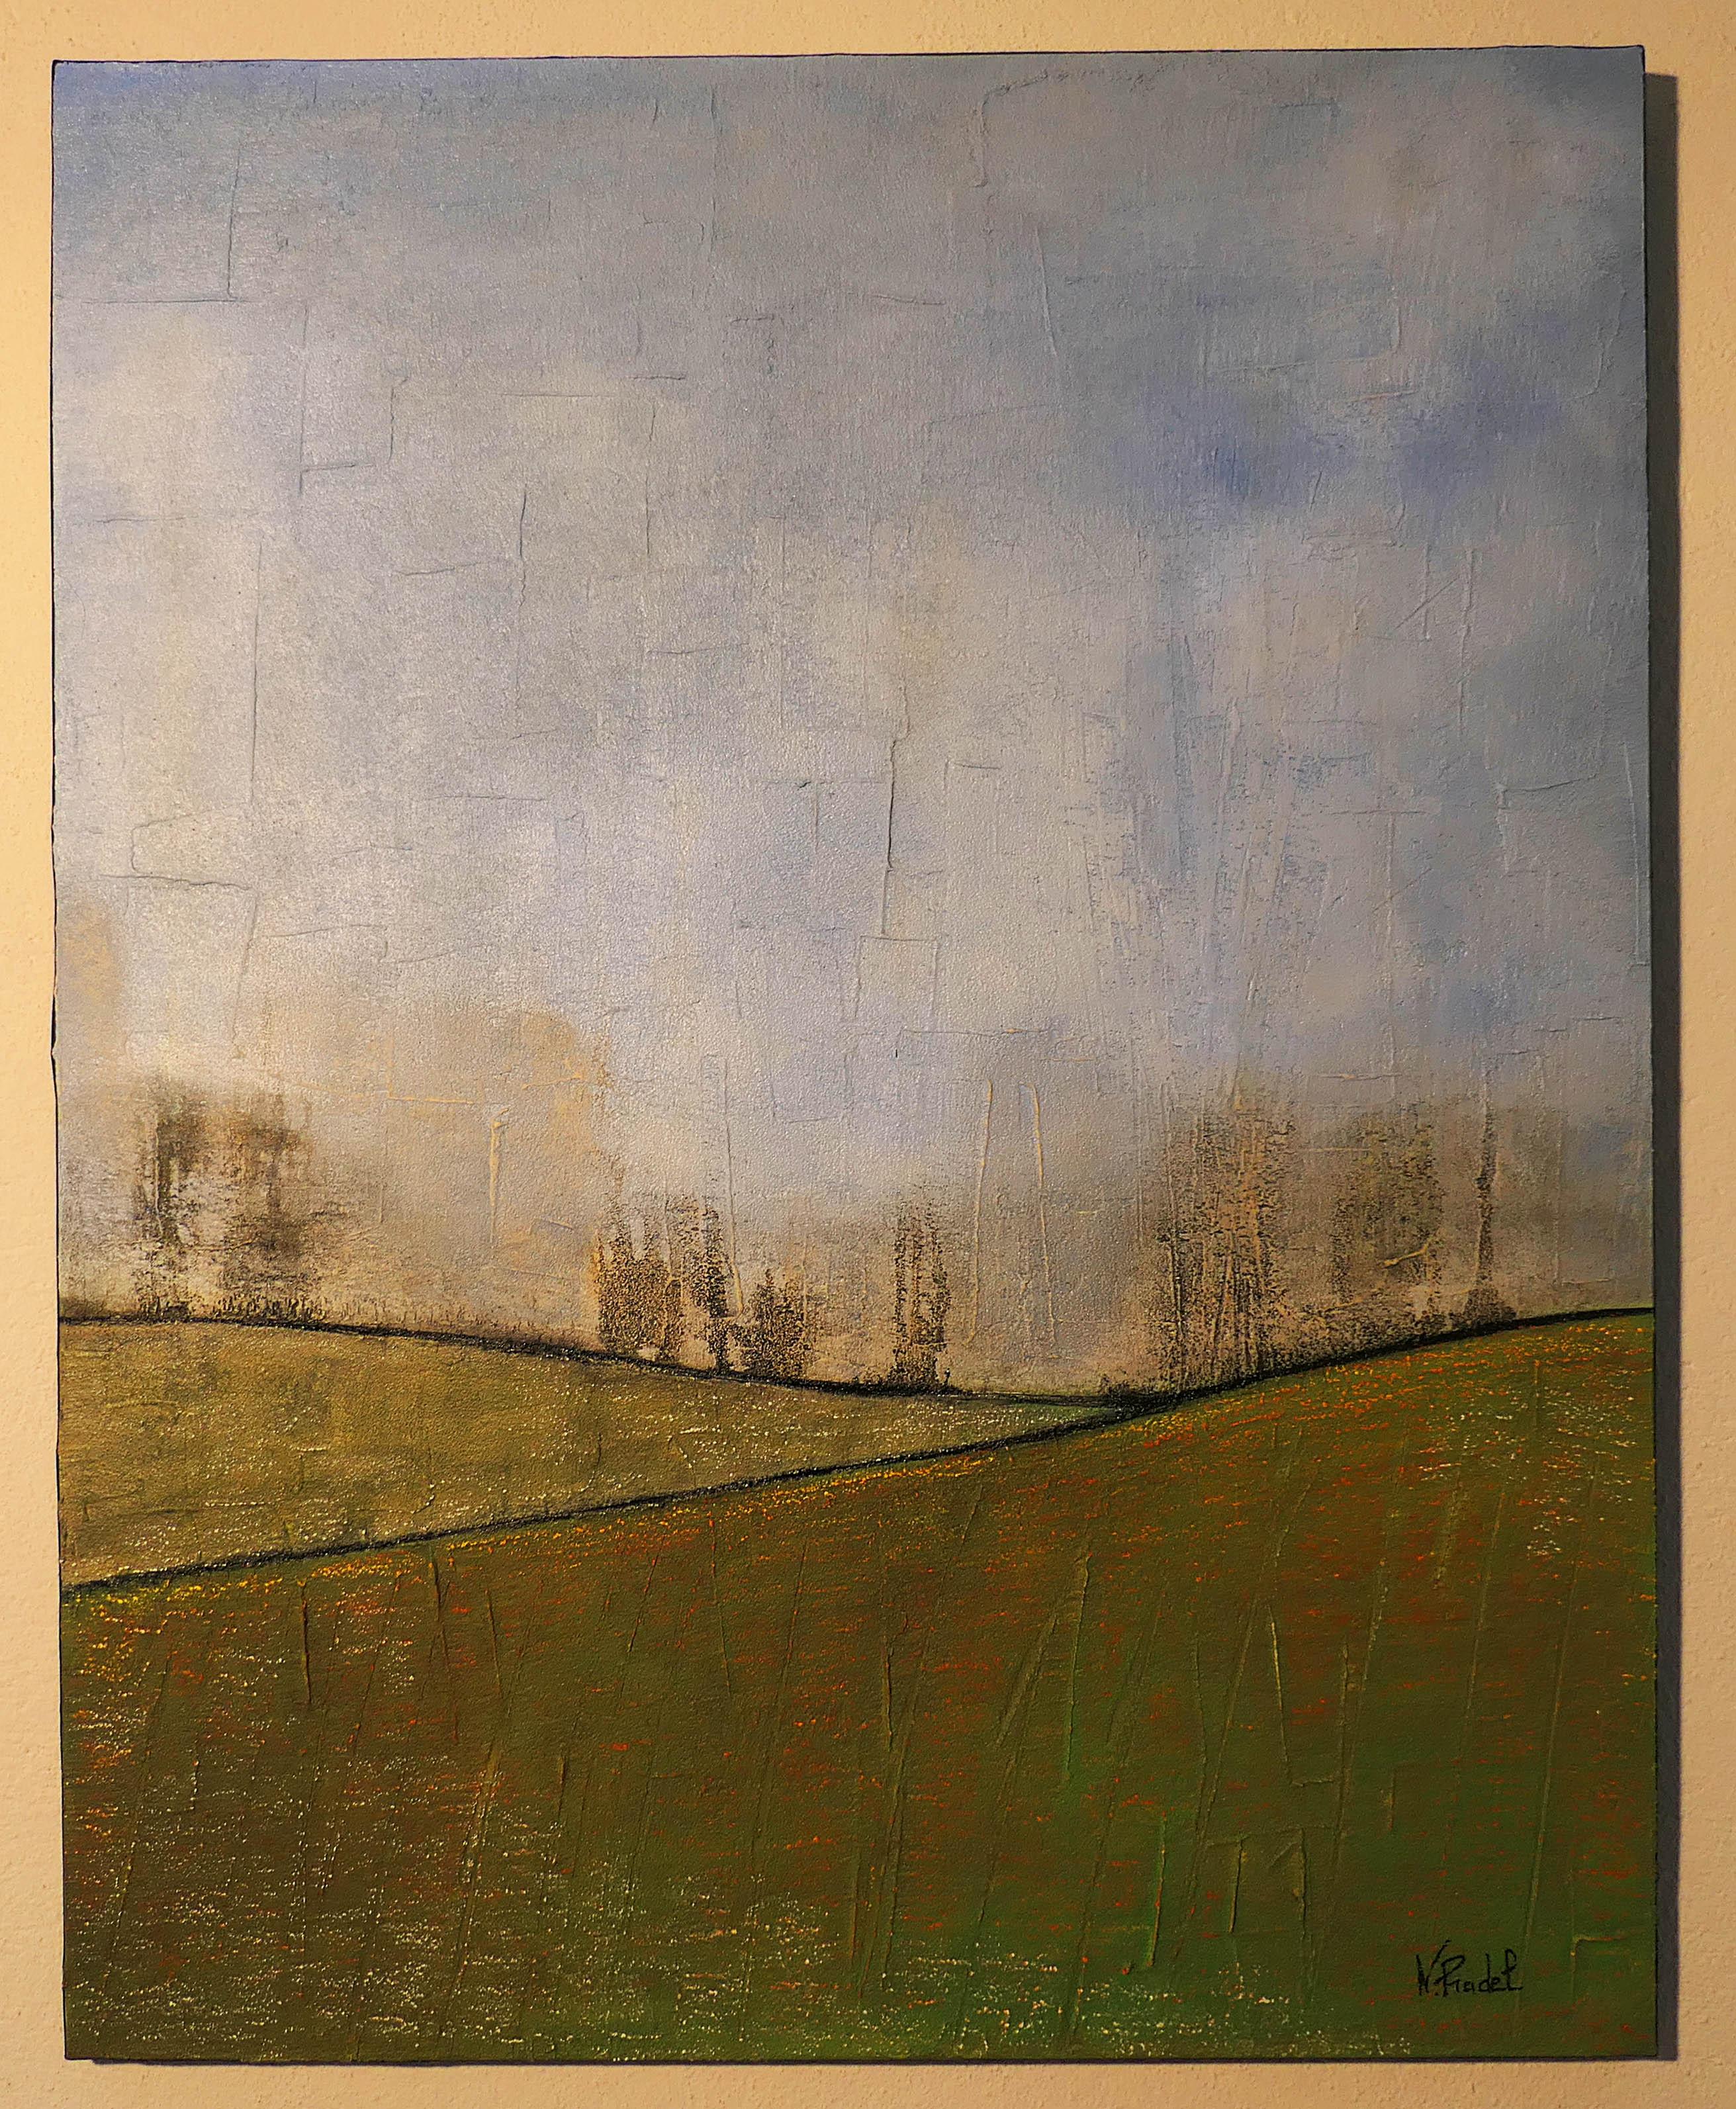 Les perce-neige, toile 92 x 73 cm